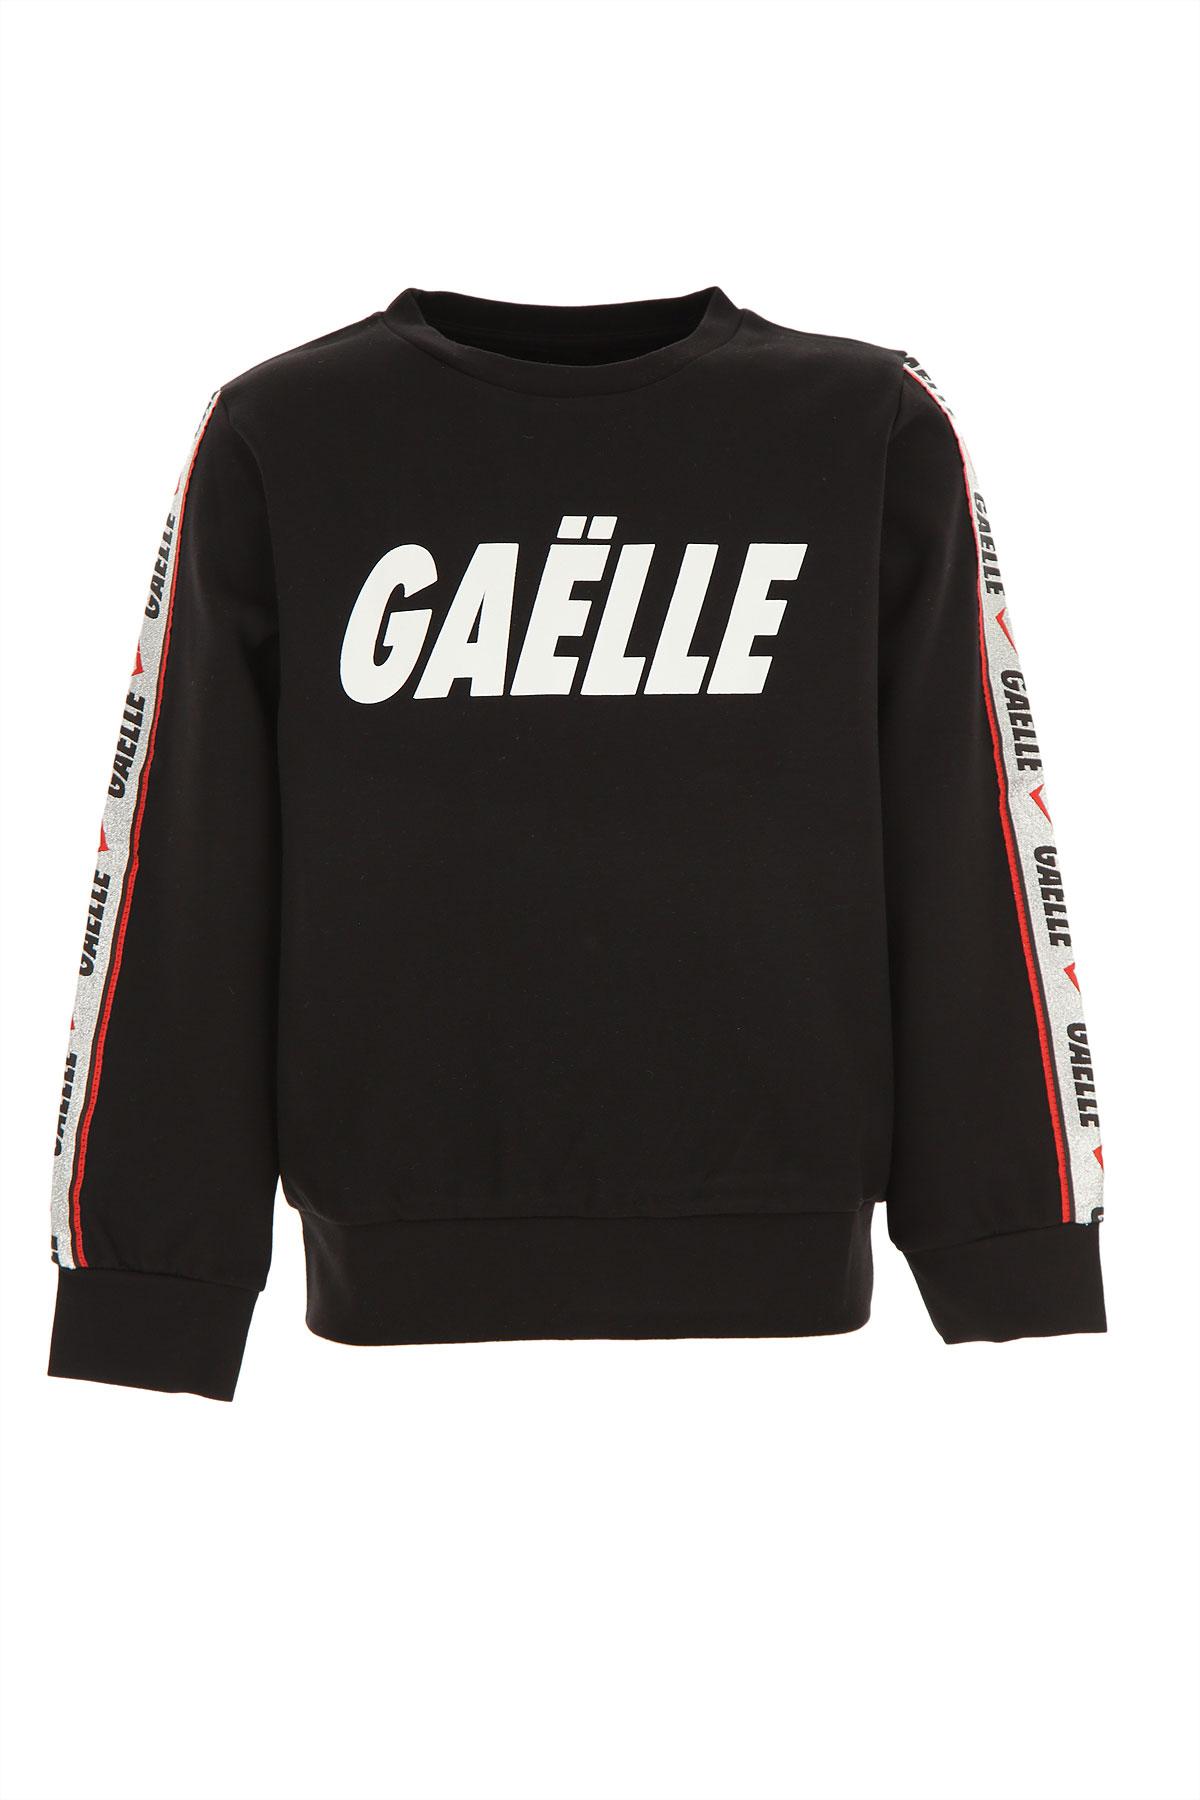 Gaelle Kids Sweatshirts & Hoodies for Girls On Sale, Black, Rayon, 2019, 10Y 12Y 14Y 4Y 6Y 8Y